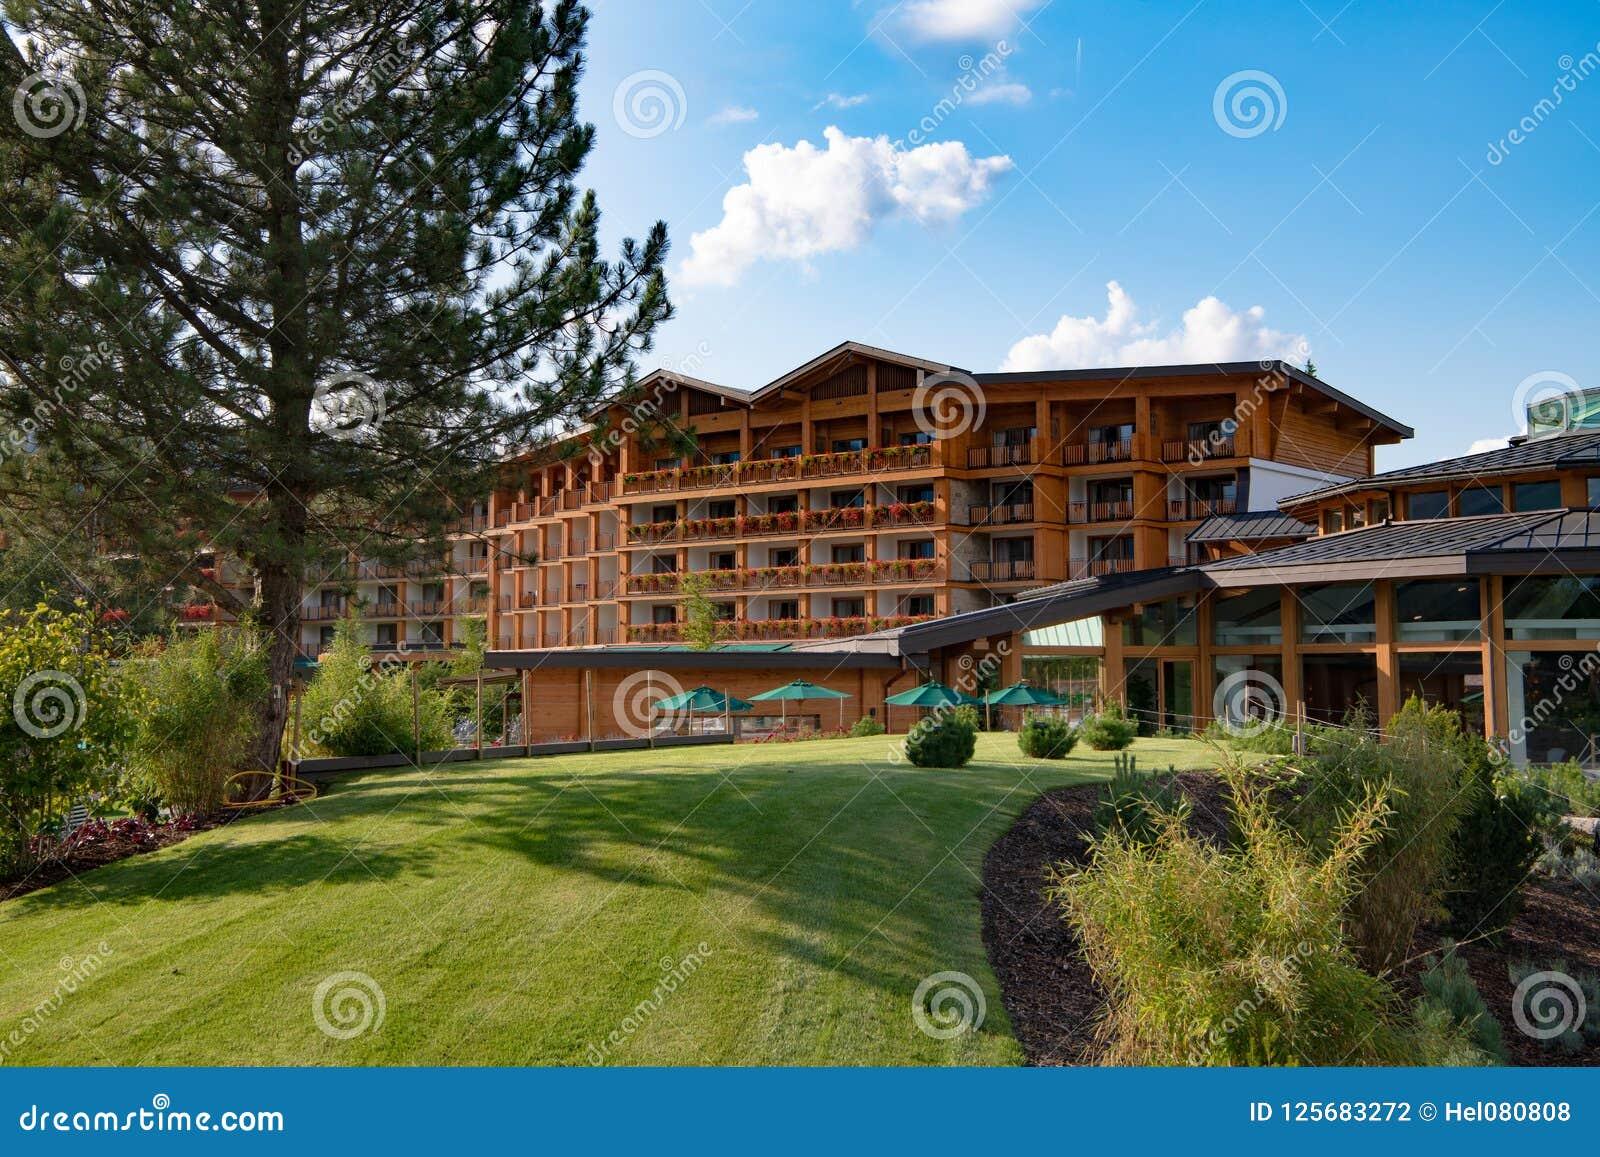 Hotel And Resort Sonnenalp Allgau Bavaria Germany Stock Photo